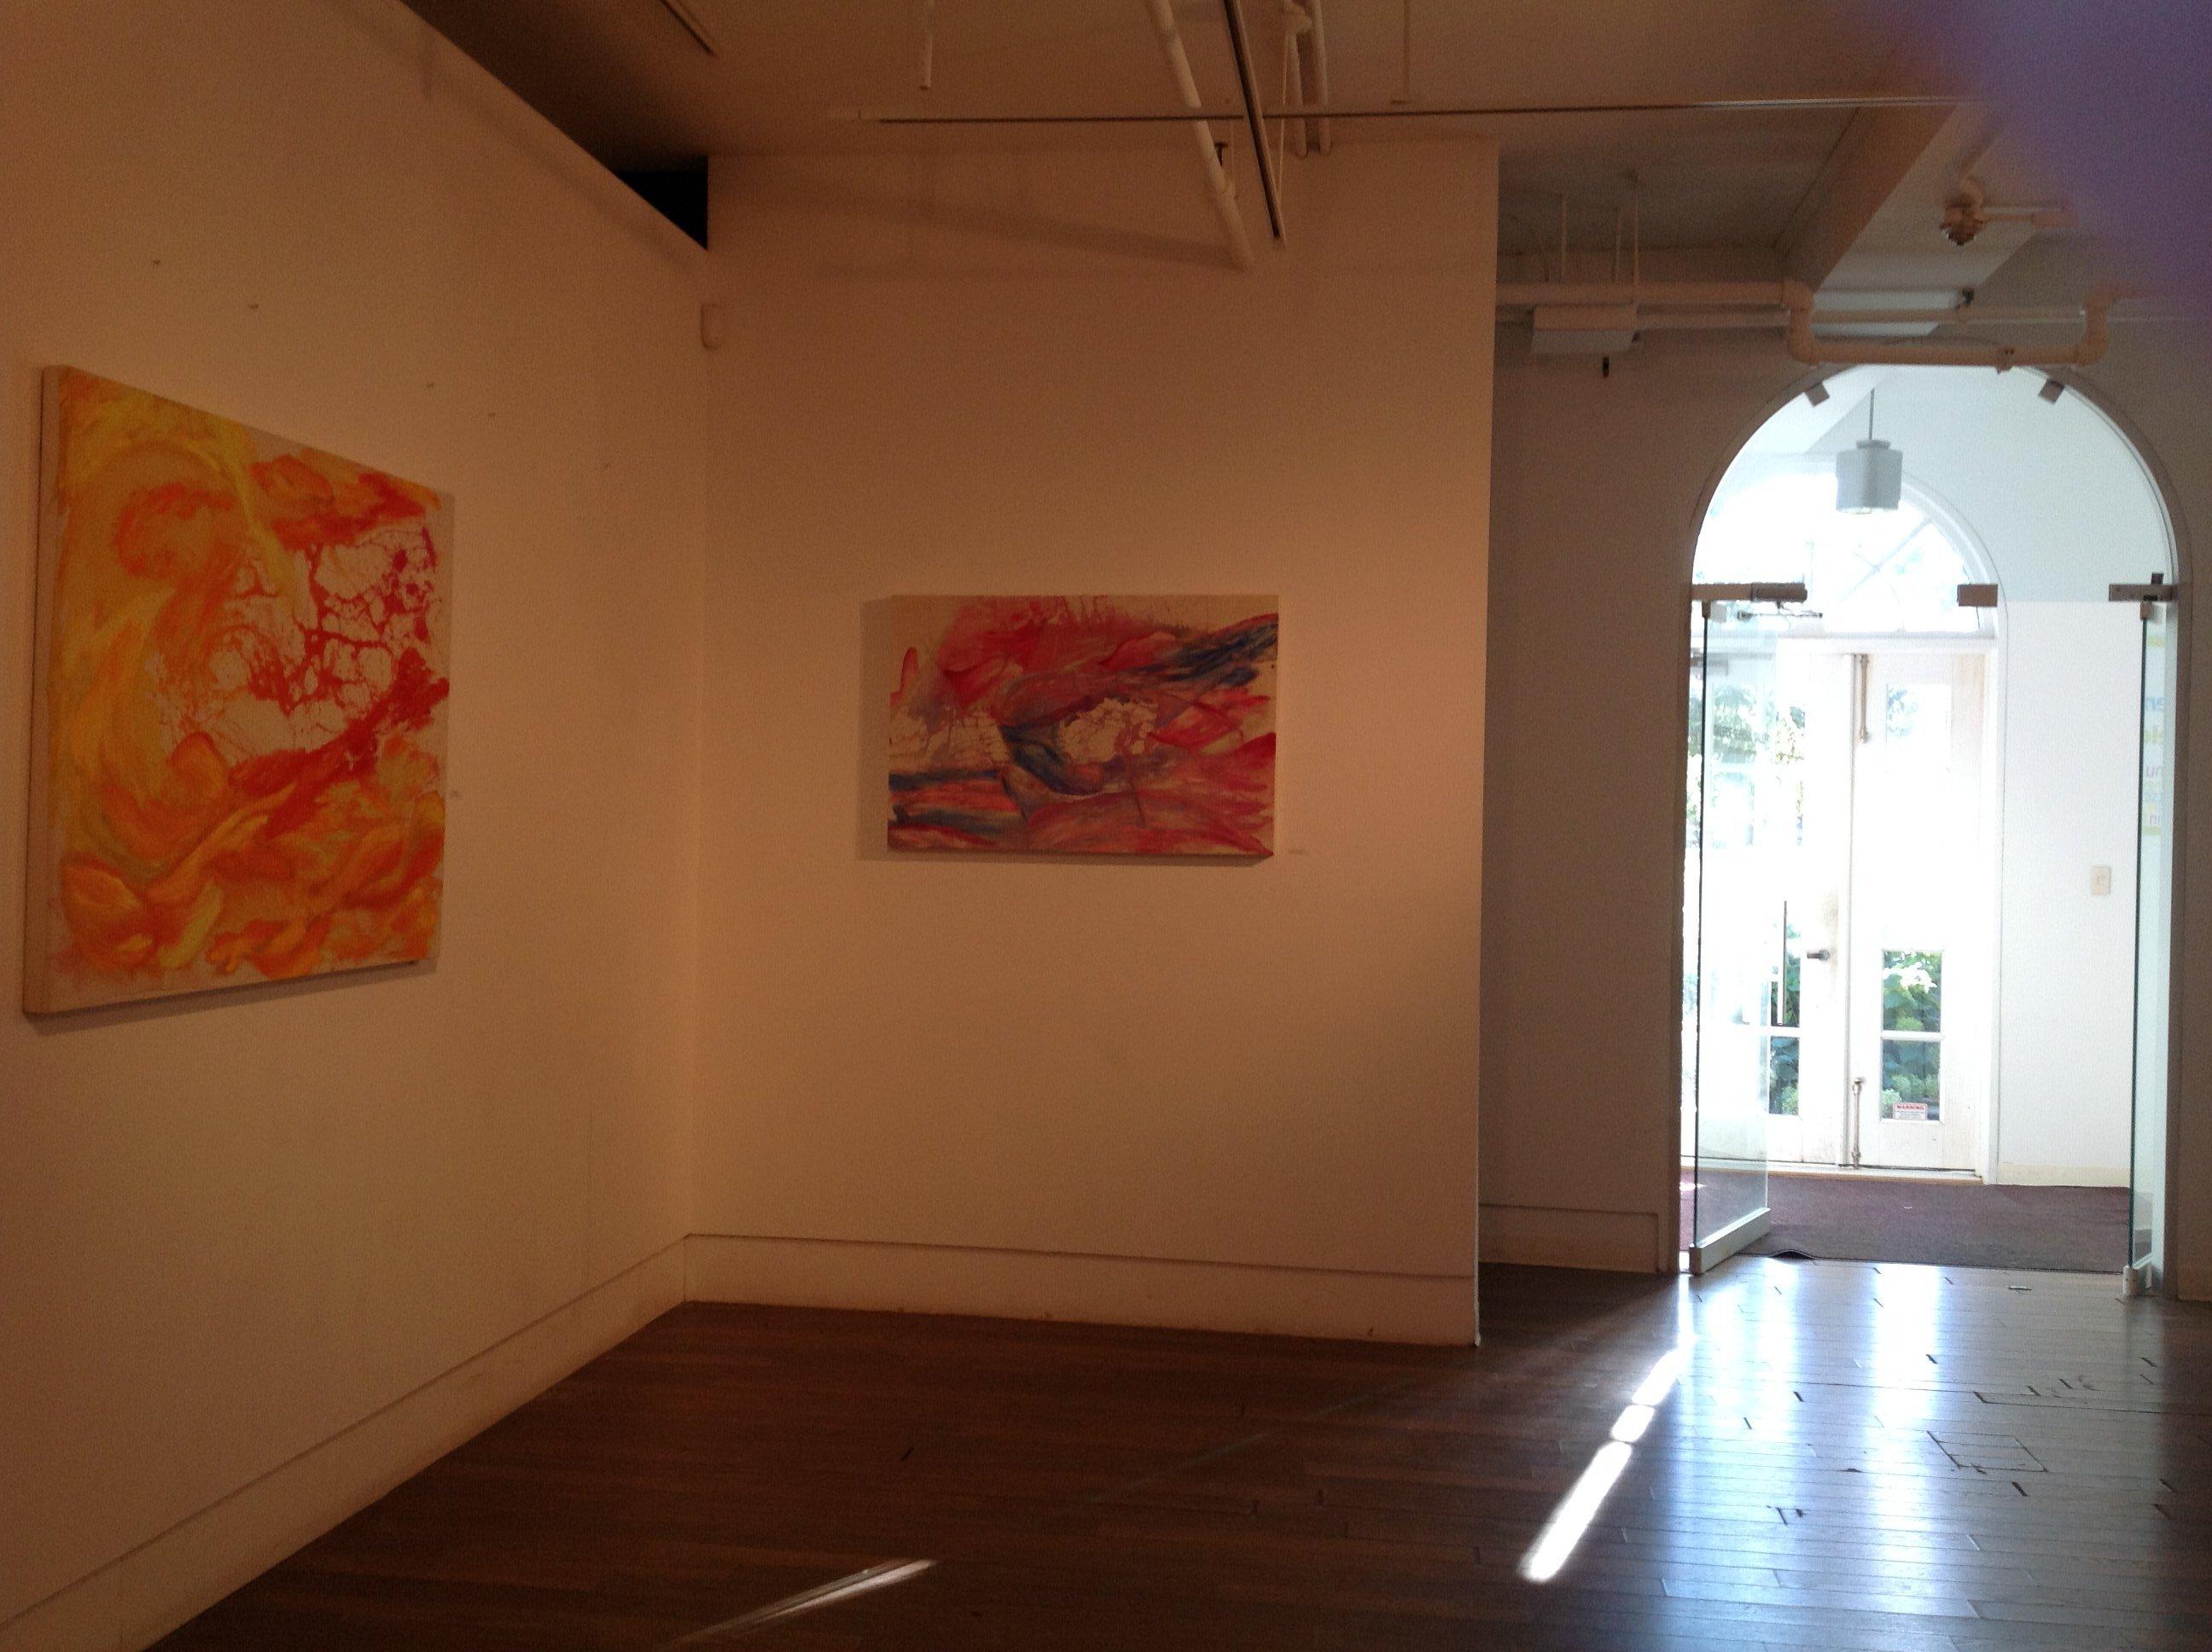 Galerie Glendon Gallery 2016_10